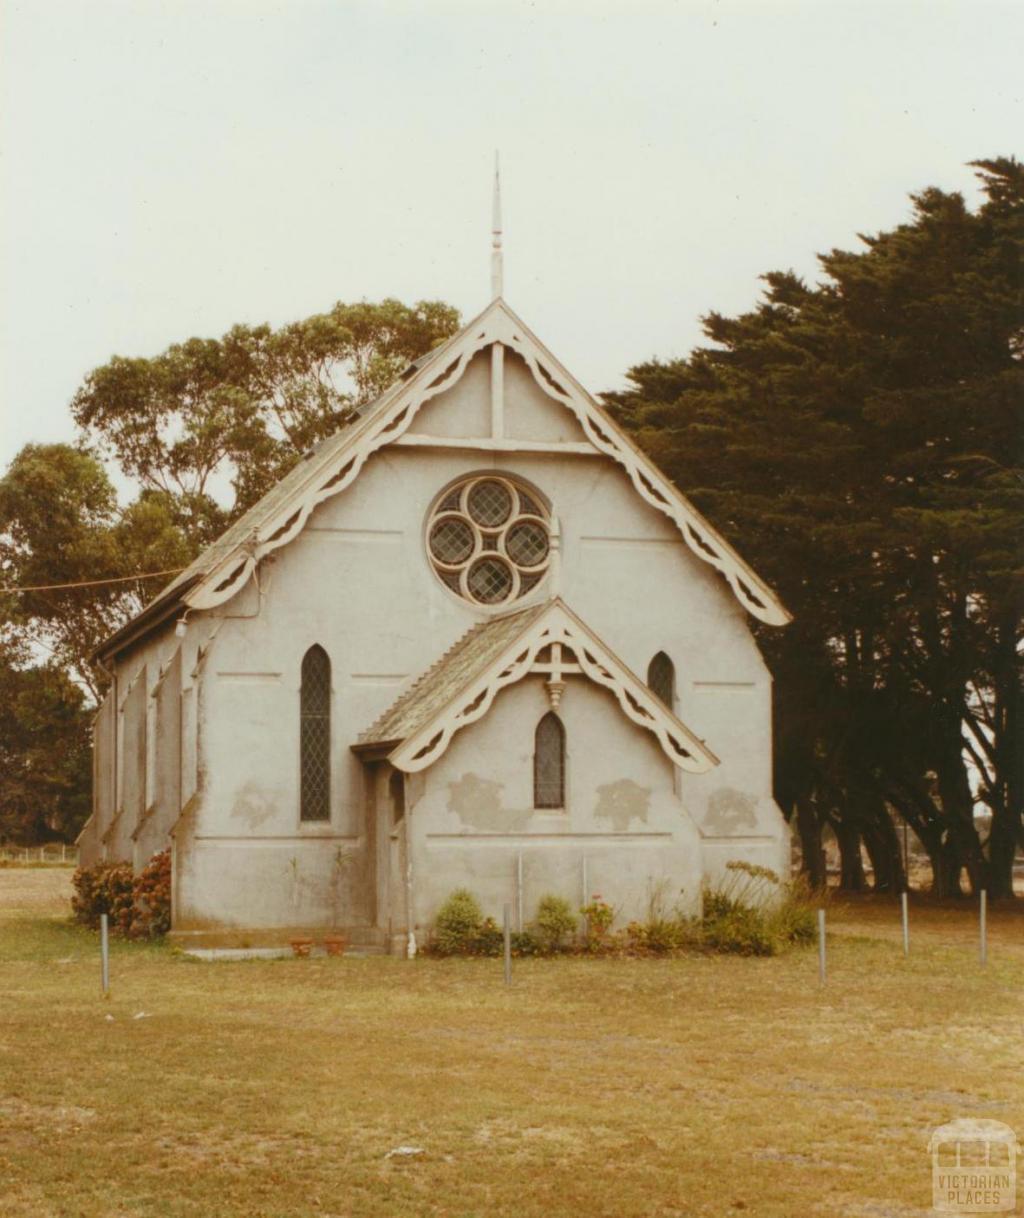 Uniting Church, Chapel Road, Keysborough, 2003